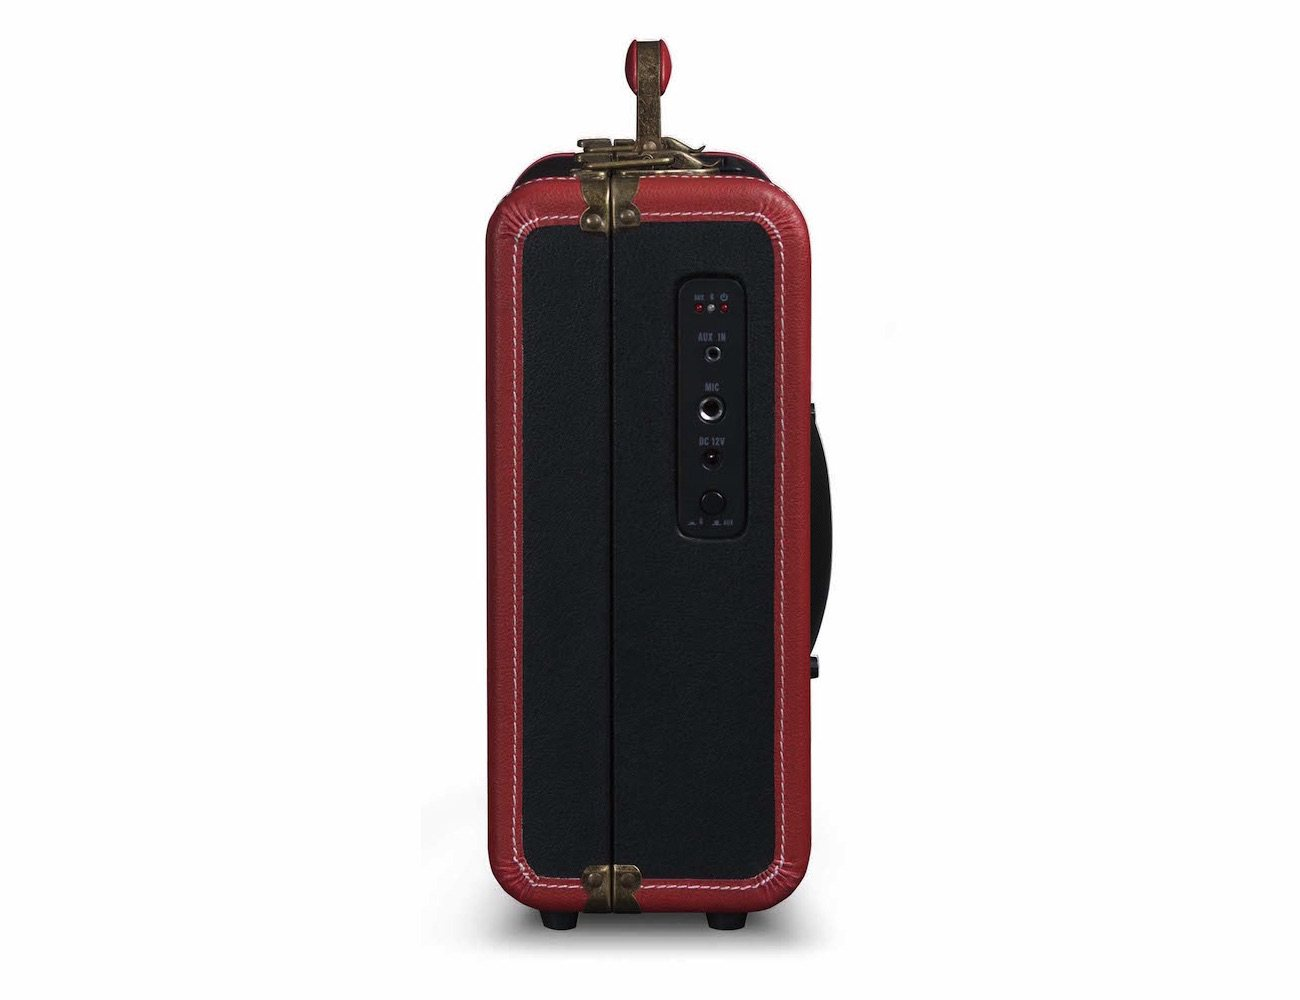 Soundbomb Suitcase Speaker by Crosley